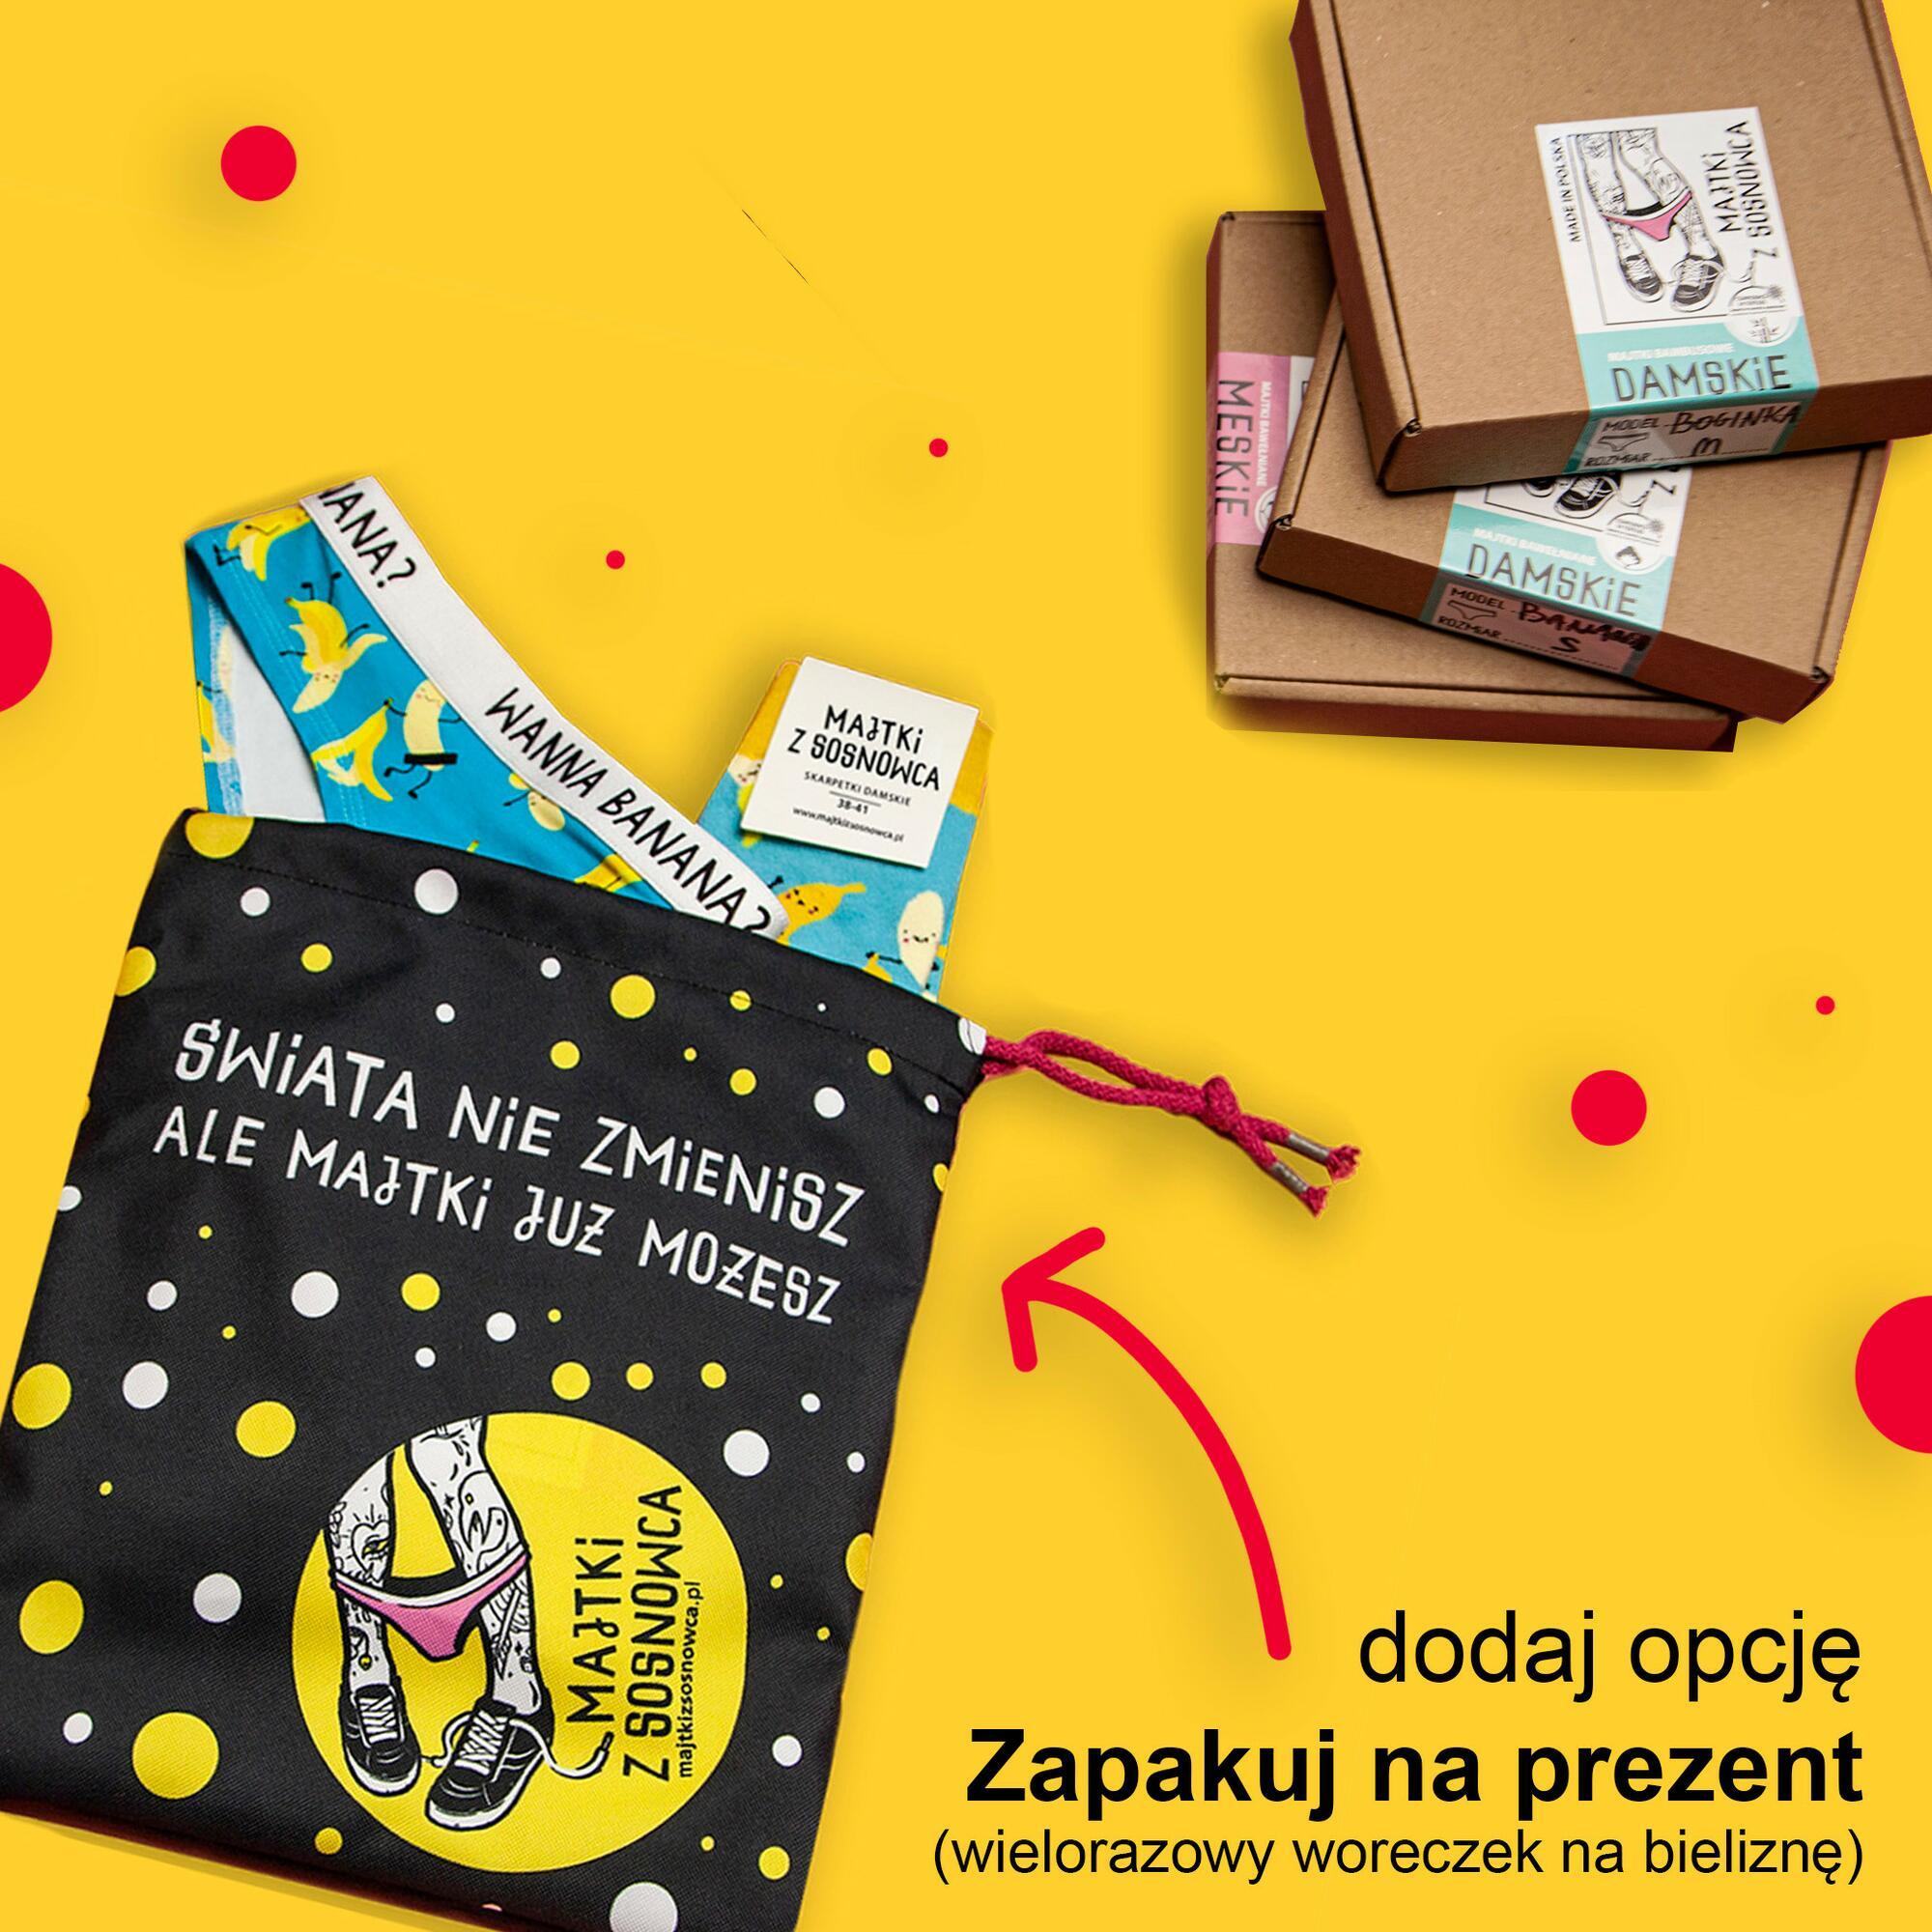 NOT TODAY - figi bambusowe damskie czarne z napisem - Majtki z Sosnowca by After Panty | JestemSlow.pl